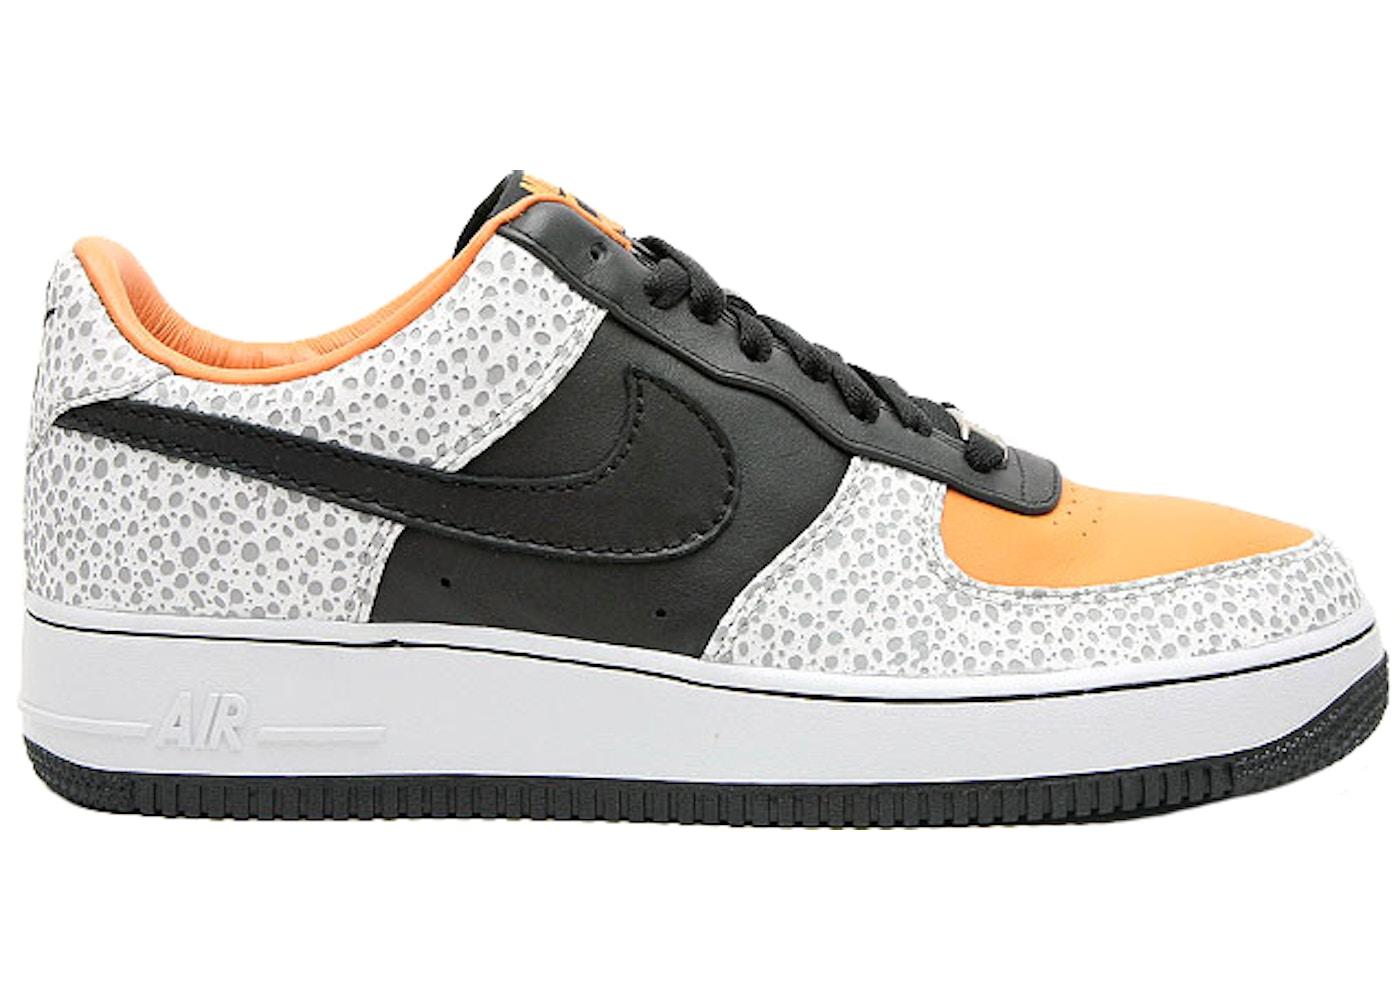 zoo Desempleados Desaparecer  Nike Air Force 1 Low Supreme Safari - 318776-801